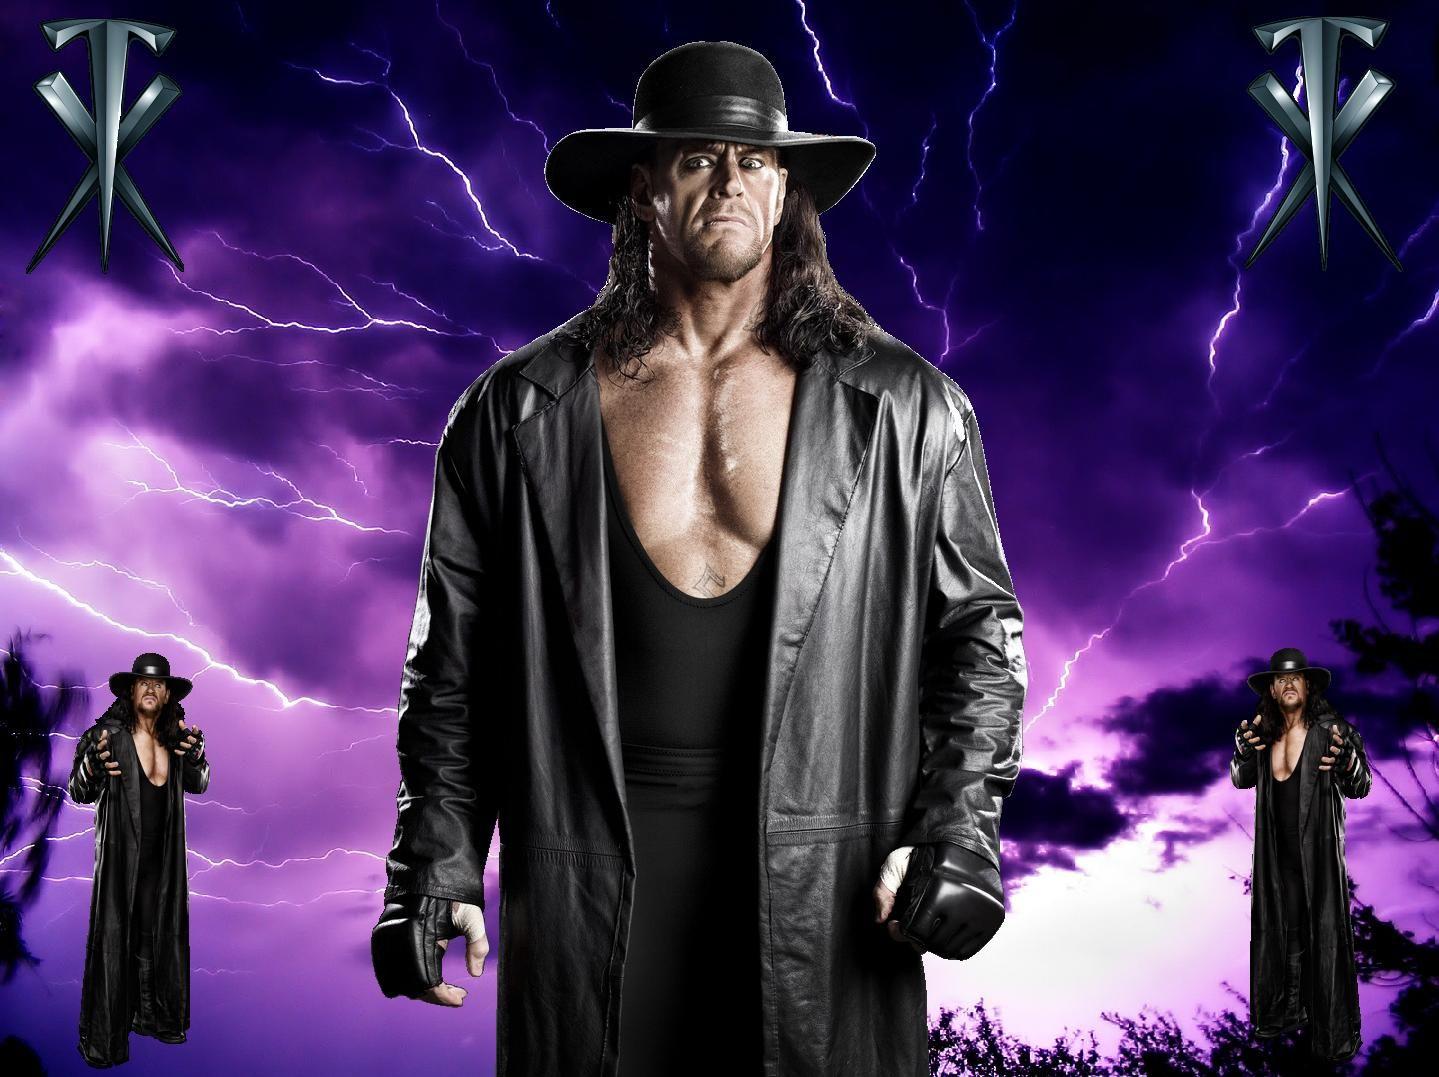 Another Good Pic Undertaker Undertaker Wwe Mobile Legend Wallpaper